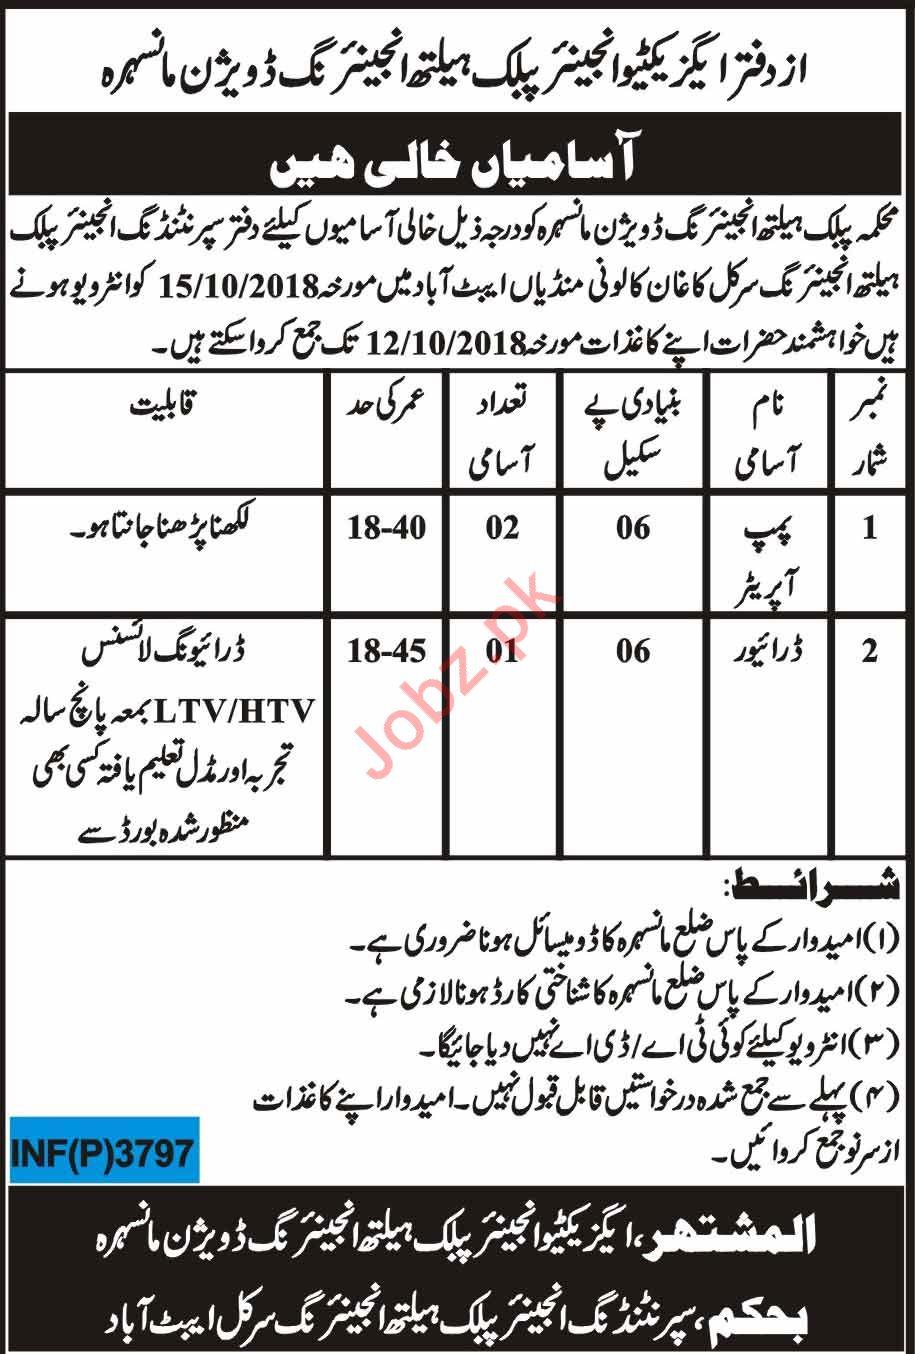 Public Health Engineering Division Jobs 2018 In Manshera KPK